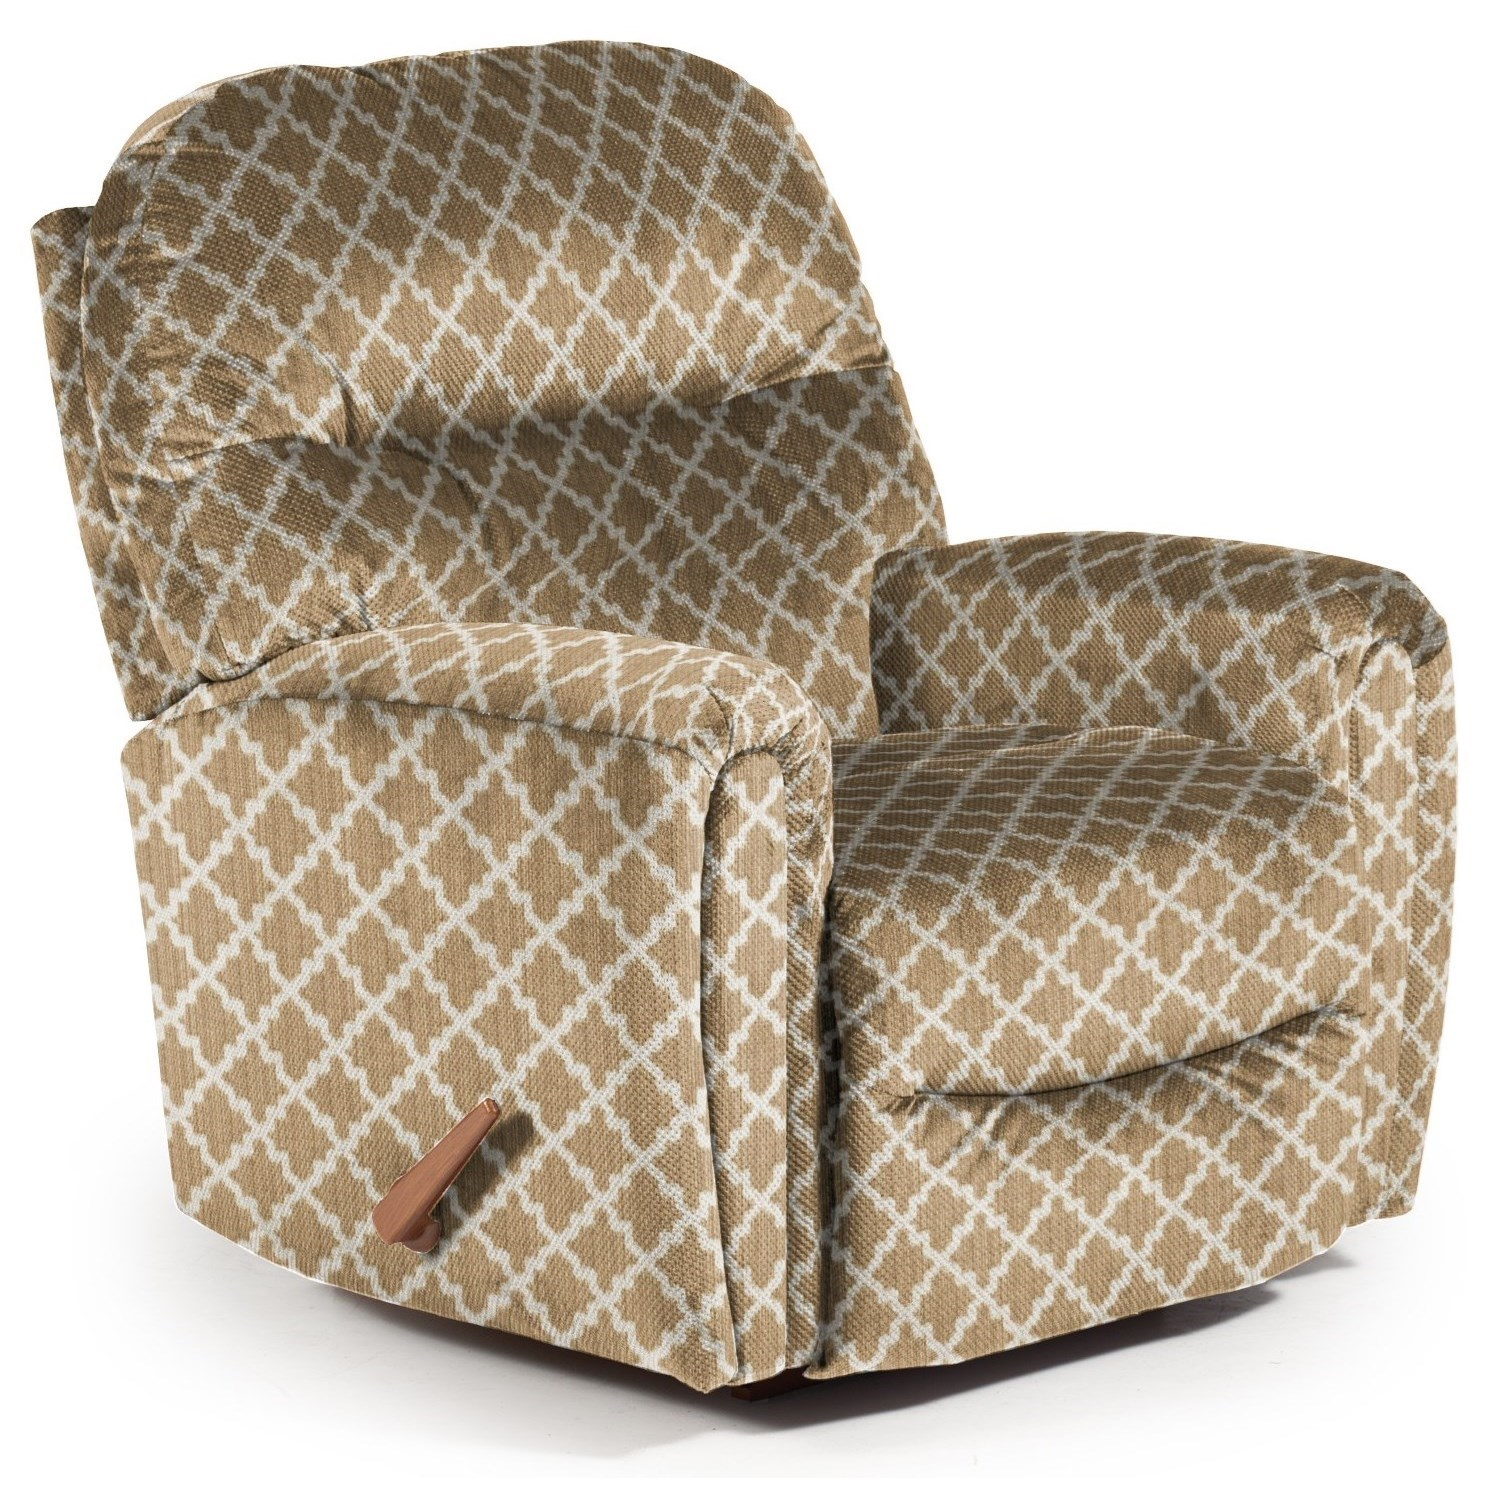 Best Home Furnishings Recliners - Medium Markson Rocker Recliner - Item Number: -962928822-28849